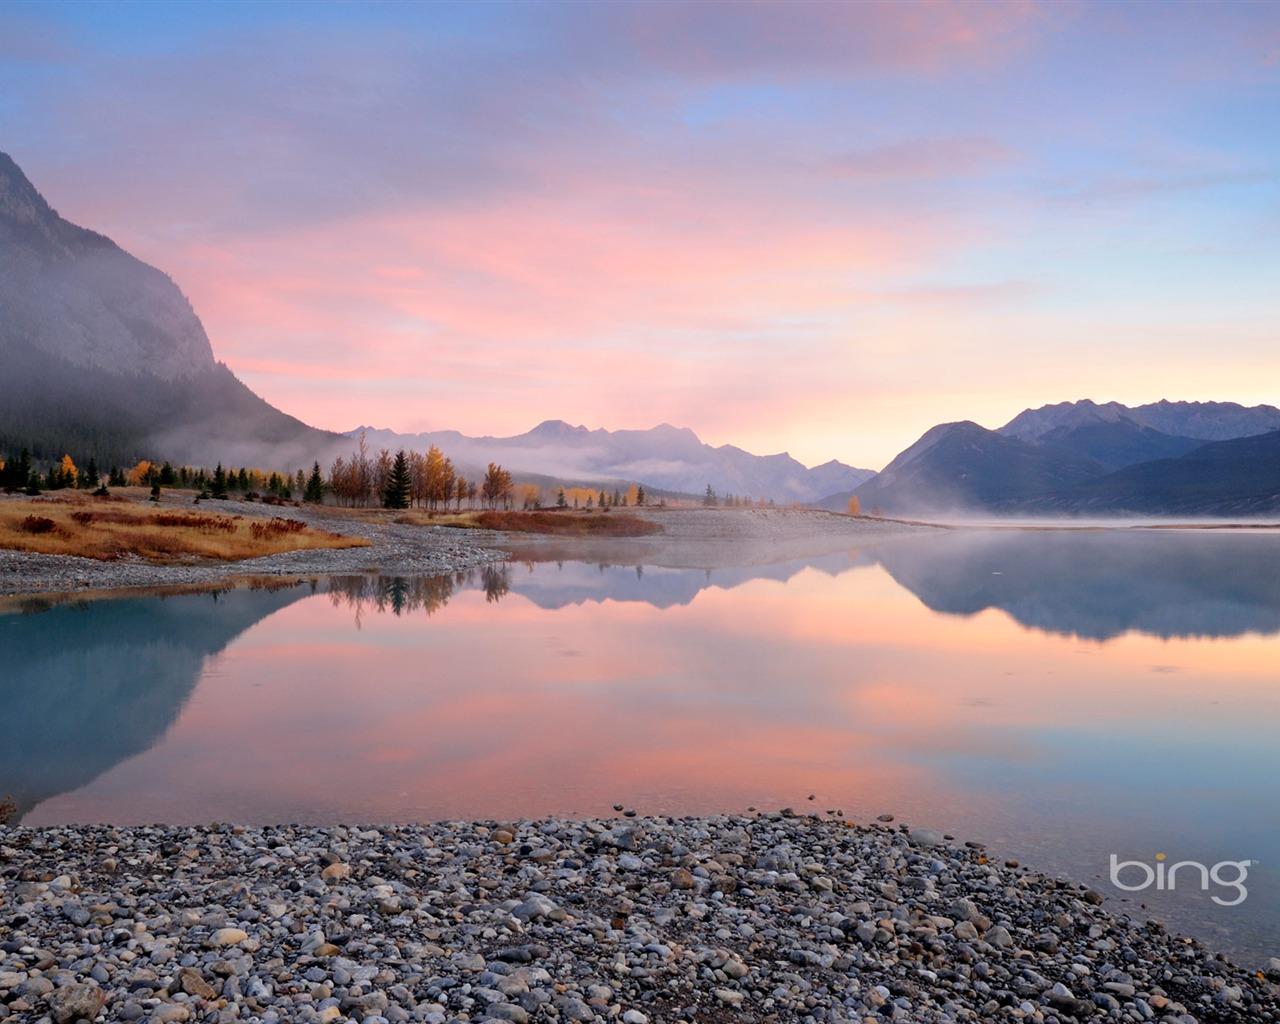 Tranquil Lake Landscapes September 2013 Bing Wallpaper